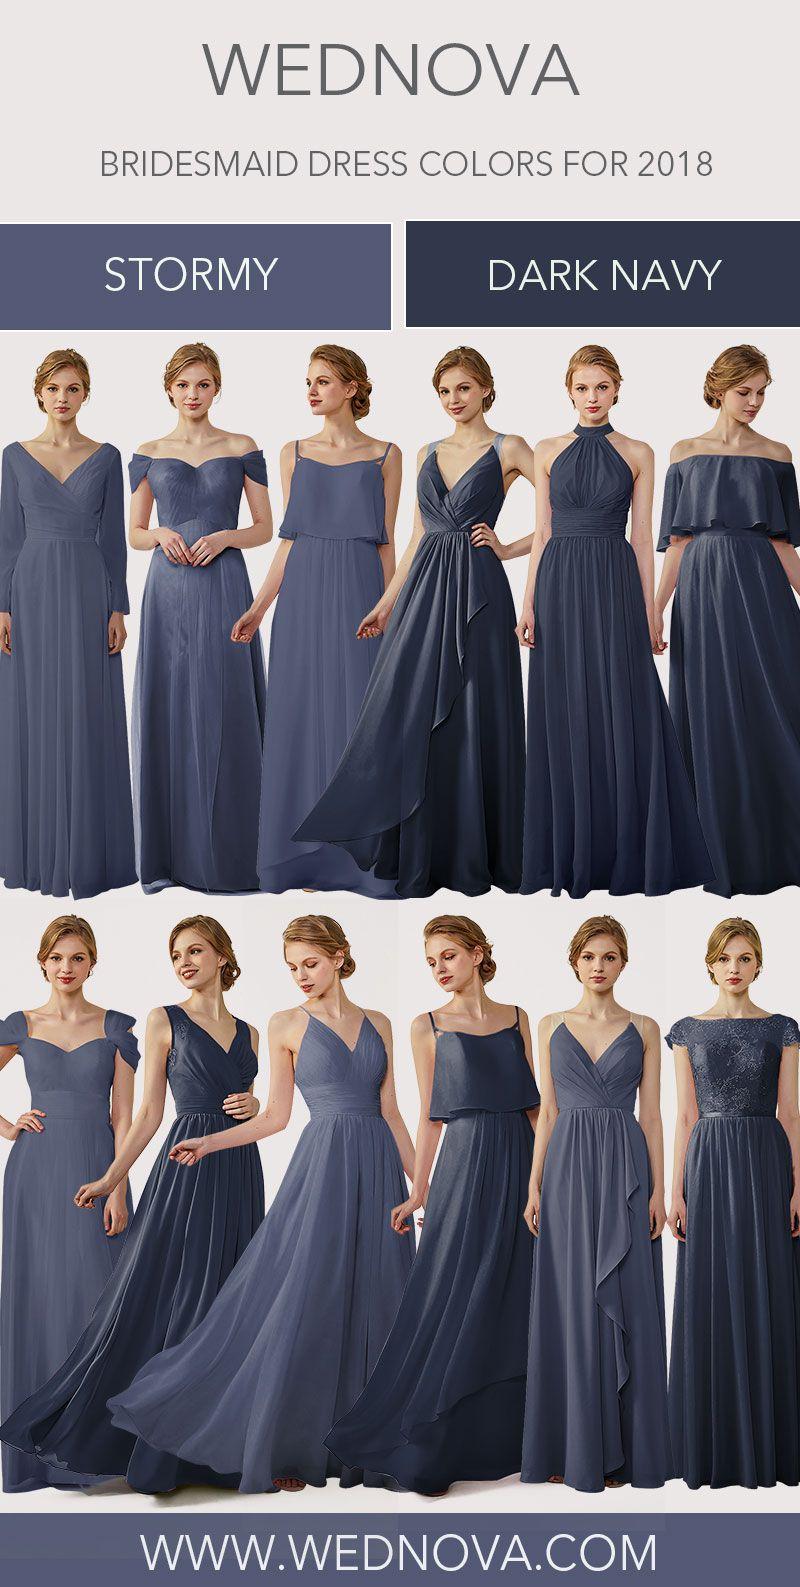 New bridesmaid dress different styles high quality dress cold shoulder dress  stormy  bridesmaiddresses bridesmaid dresses  6d404c87176f